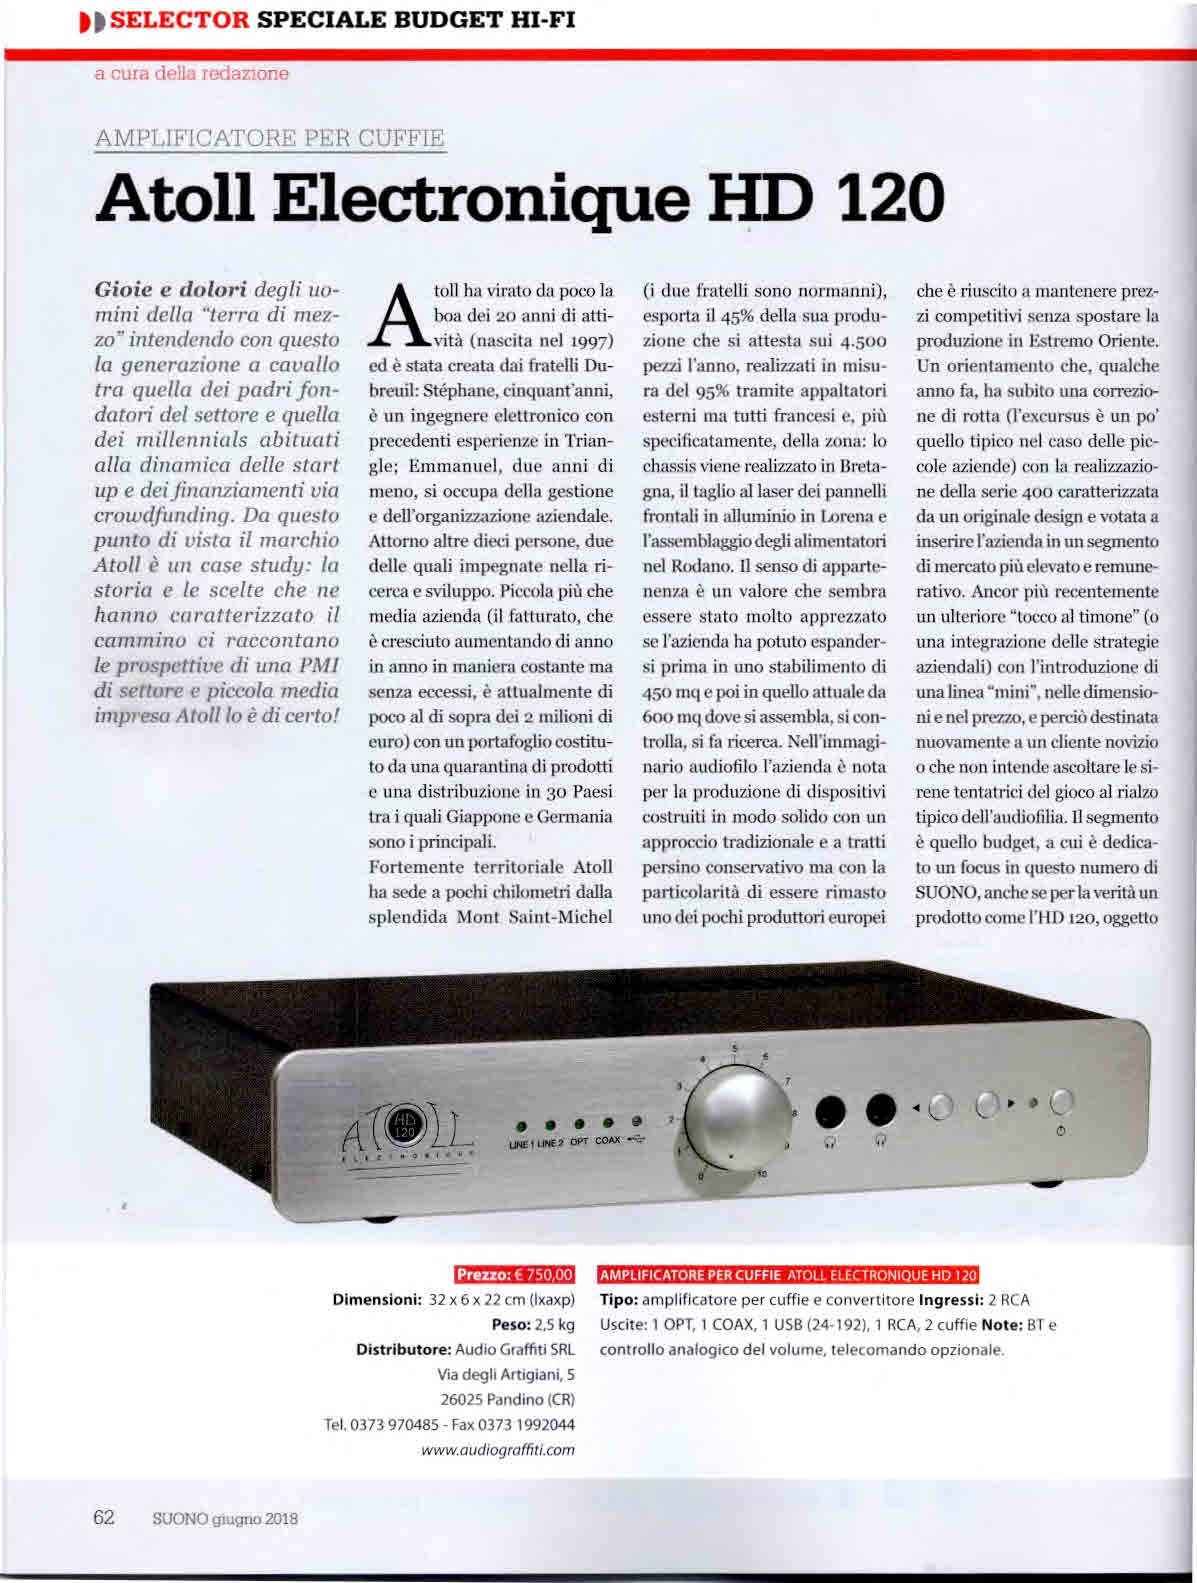 Atoll HD120